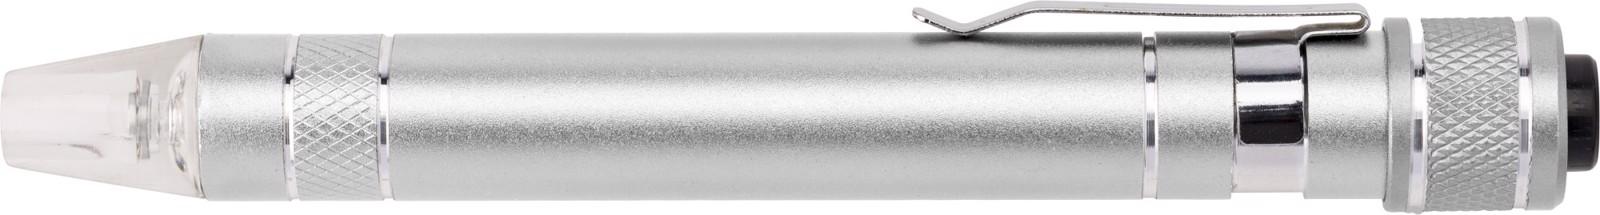 Aluminium pocket screwdriver - Silver